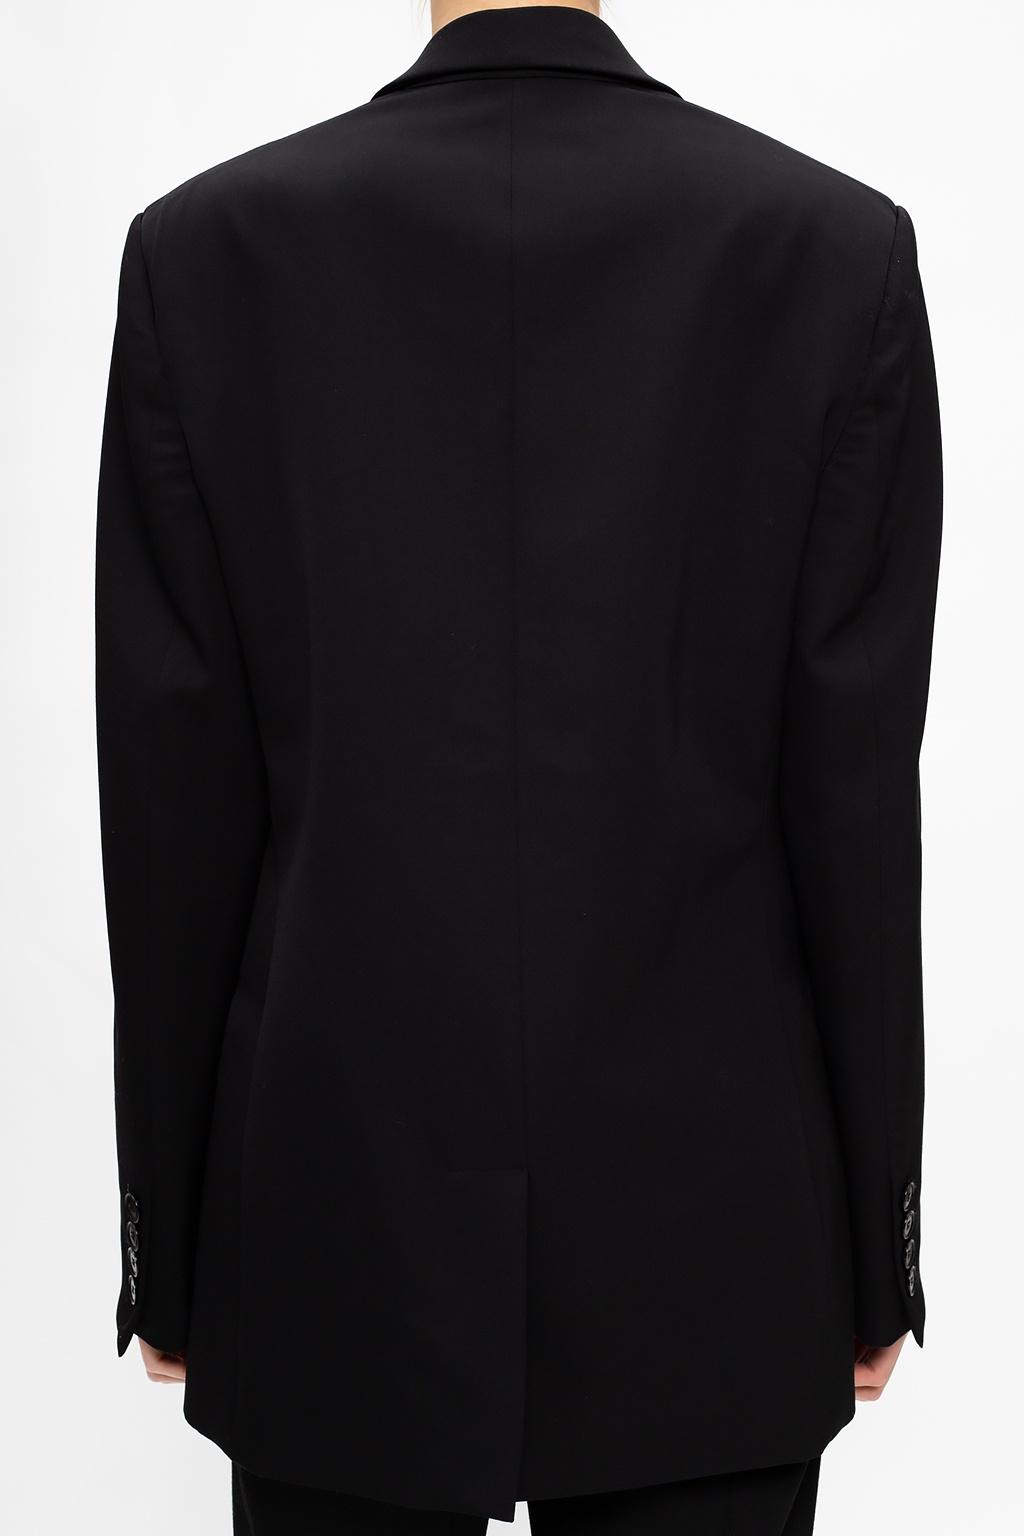 Stella McCartney Blazer with pockets